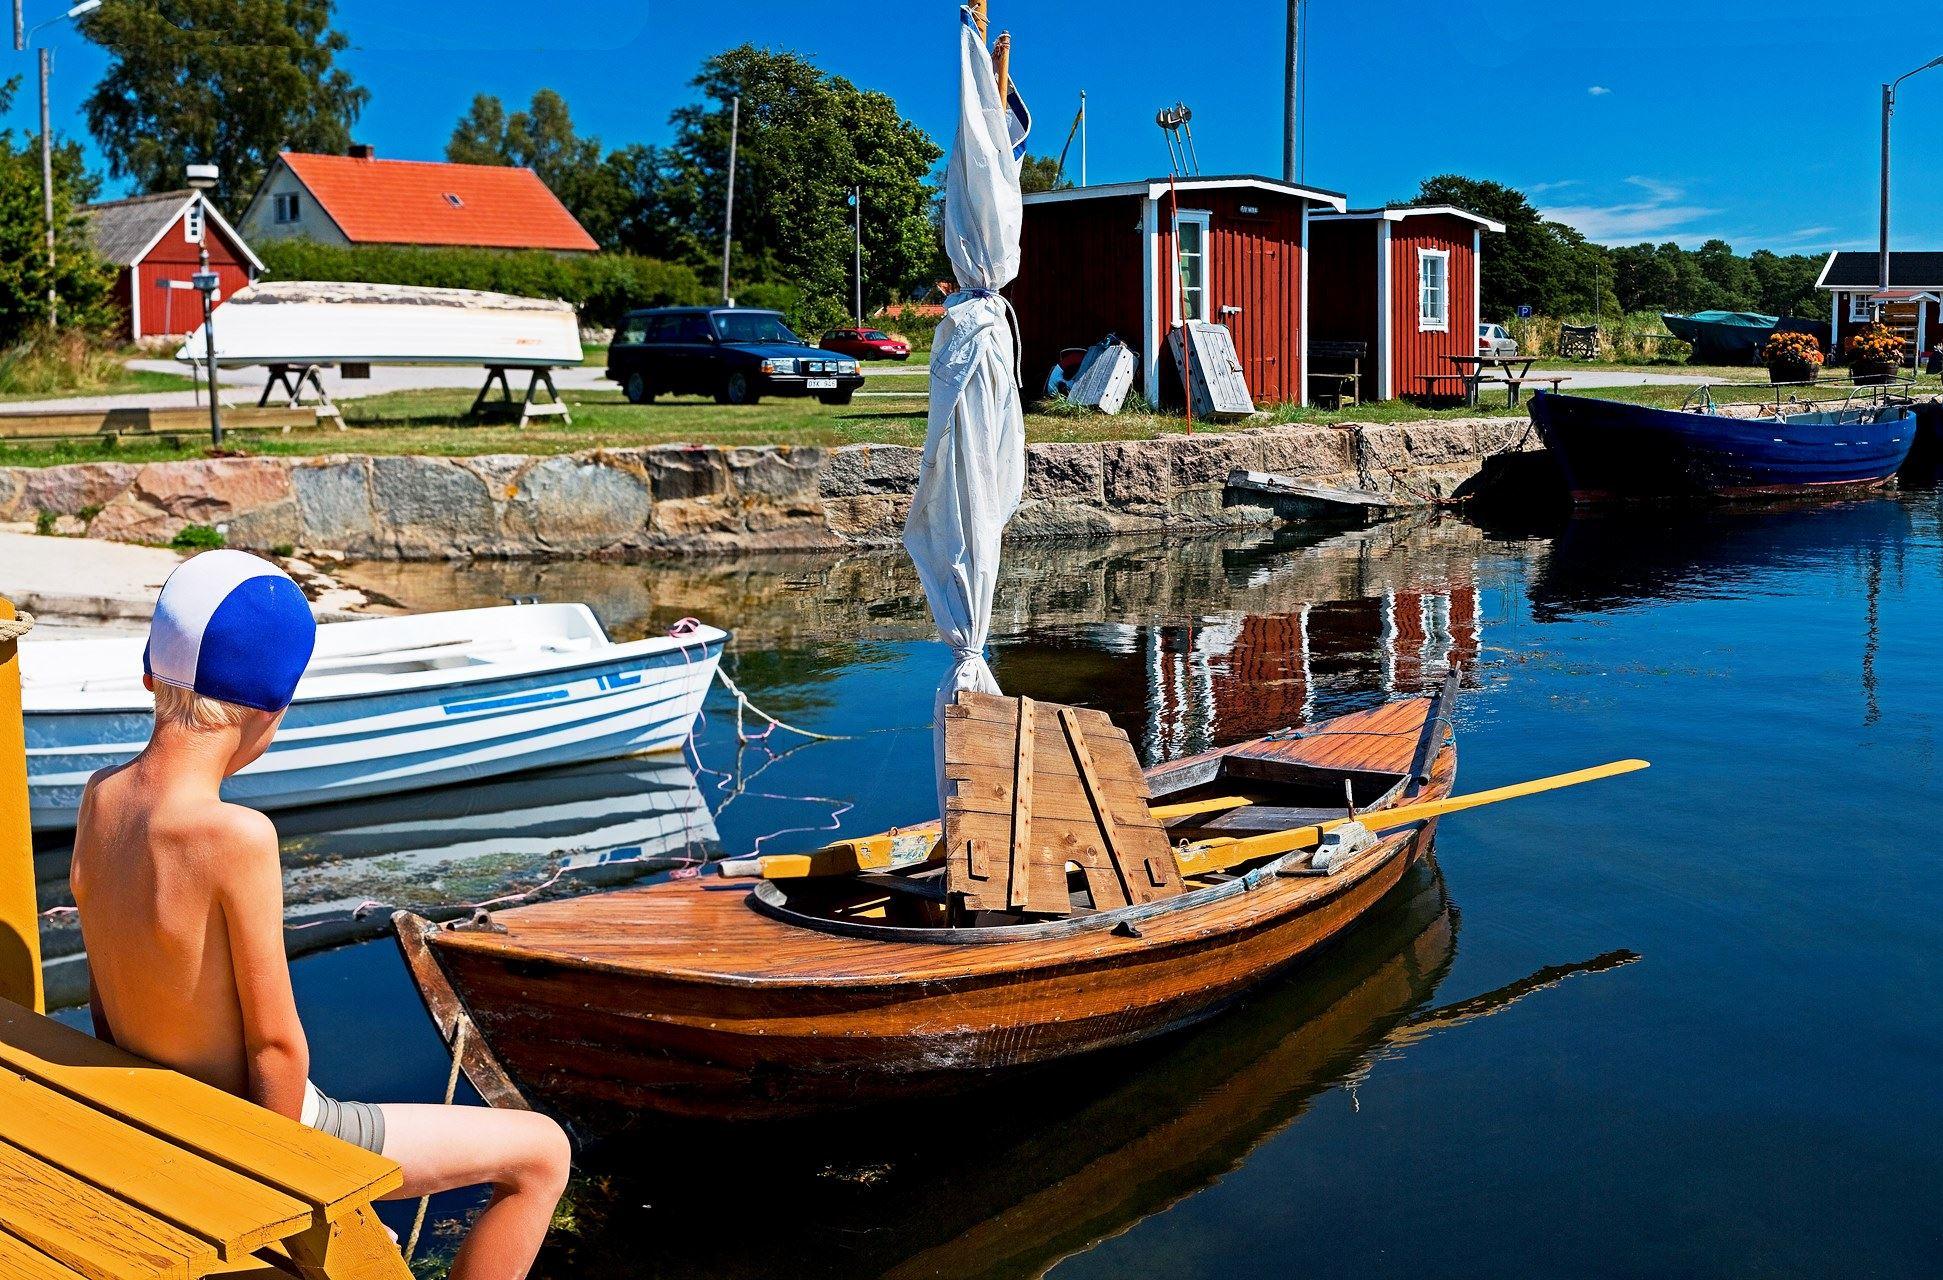 Mobile home - Torsö gästhamn